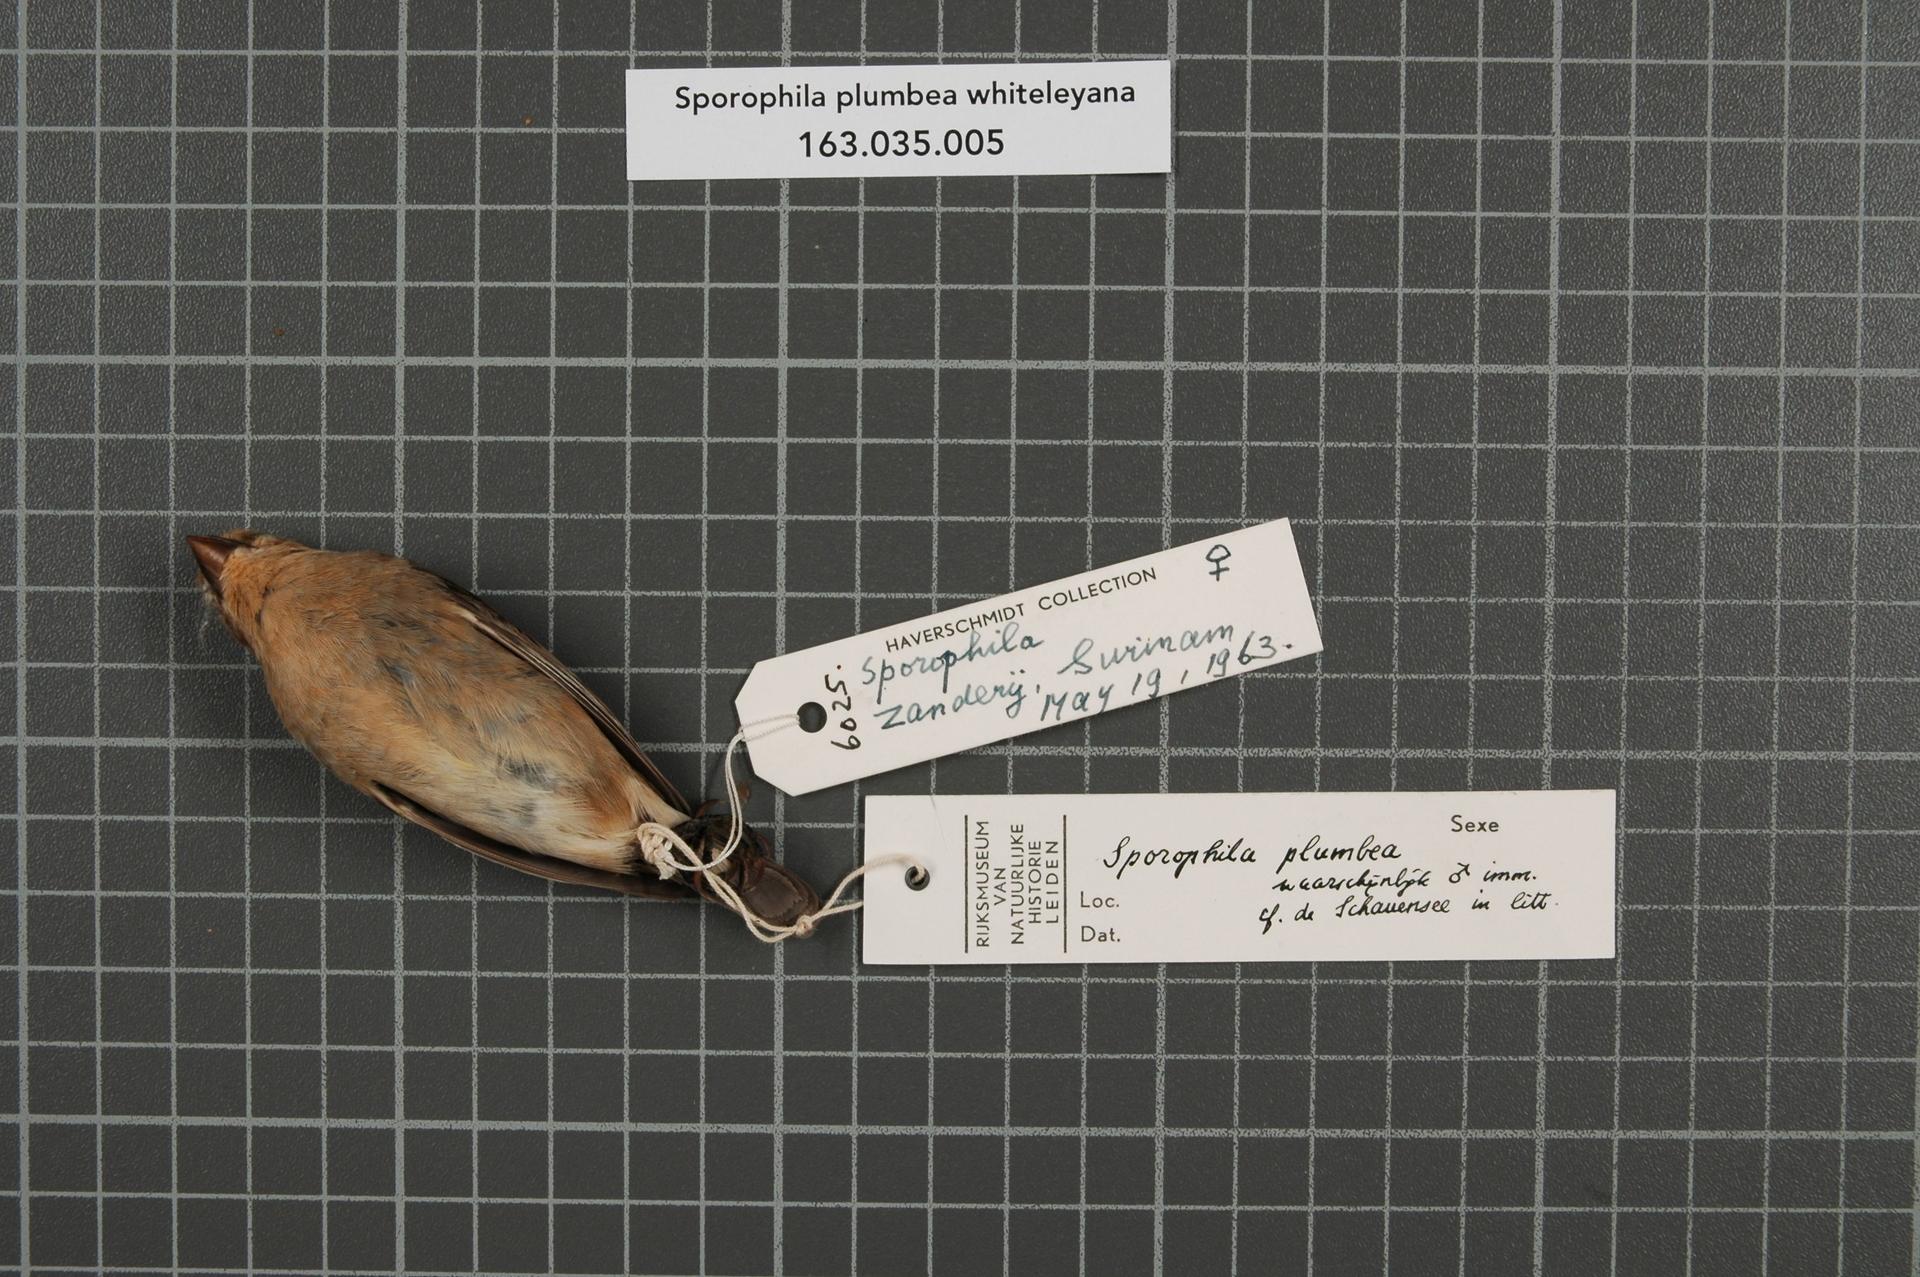 RMNH.AVES.34809   Sporophila plumbea whiteleyana (Sharpe, 1888)